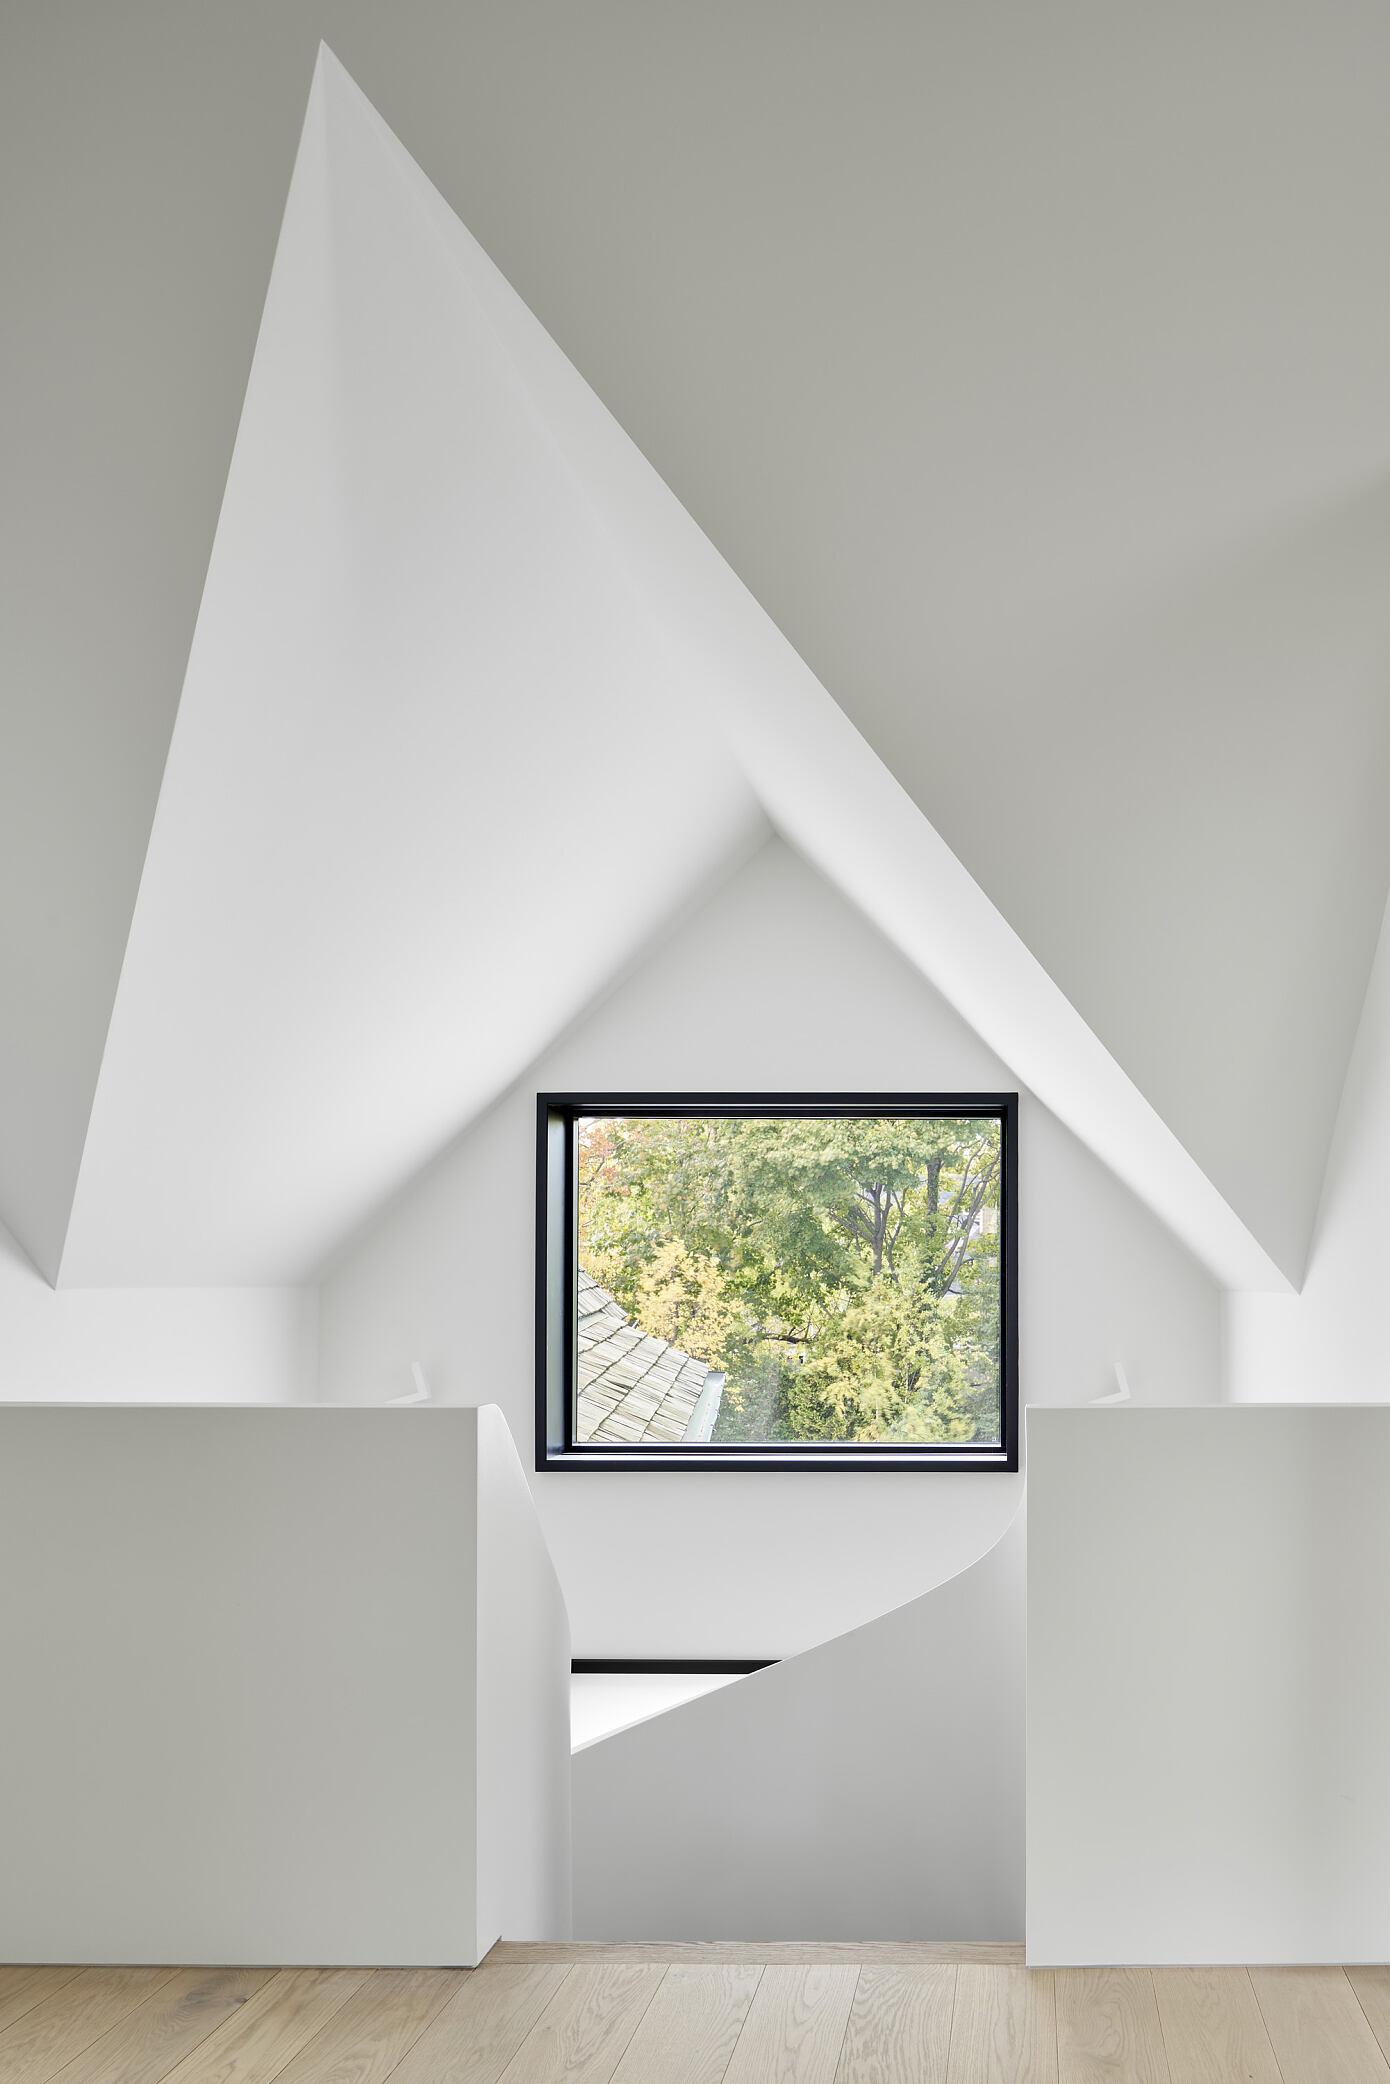 Forest Hill House by Reigo & Bauer